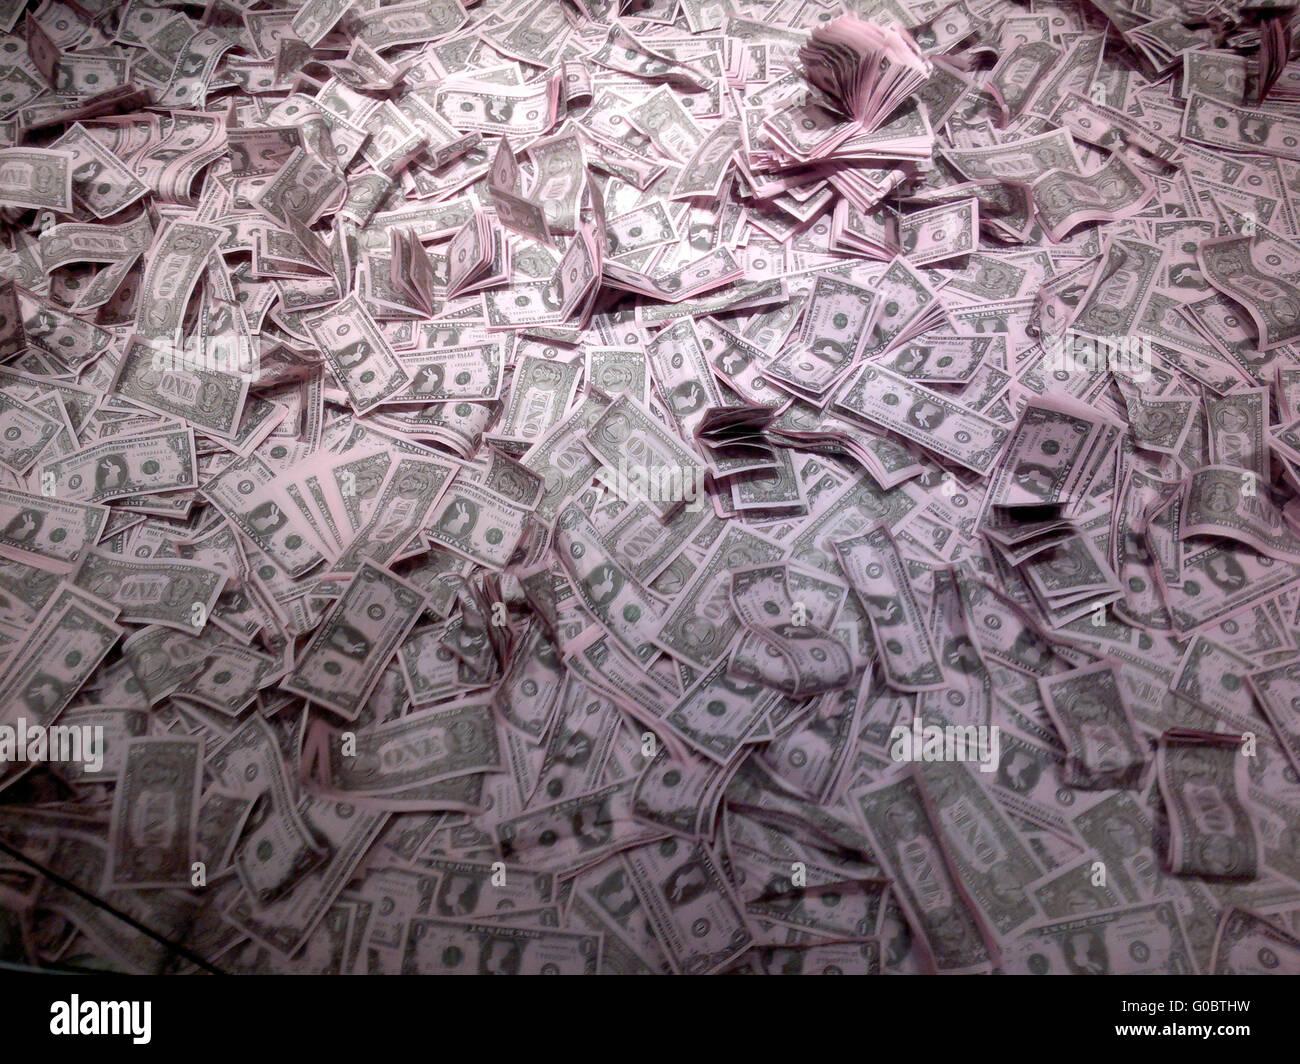 Geld: US Dollar, Berlin. - Stock Image